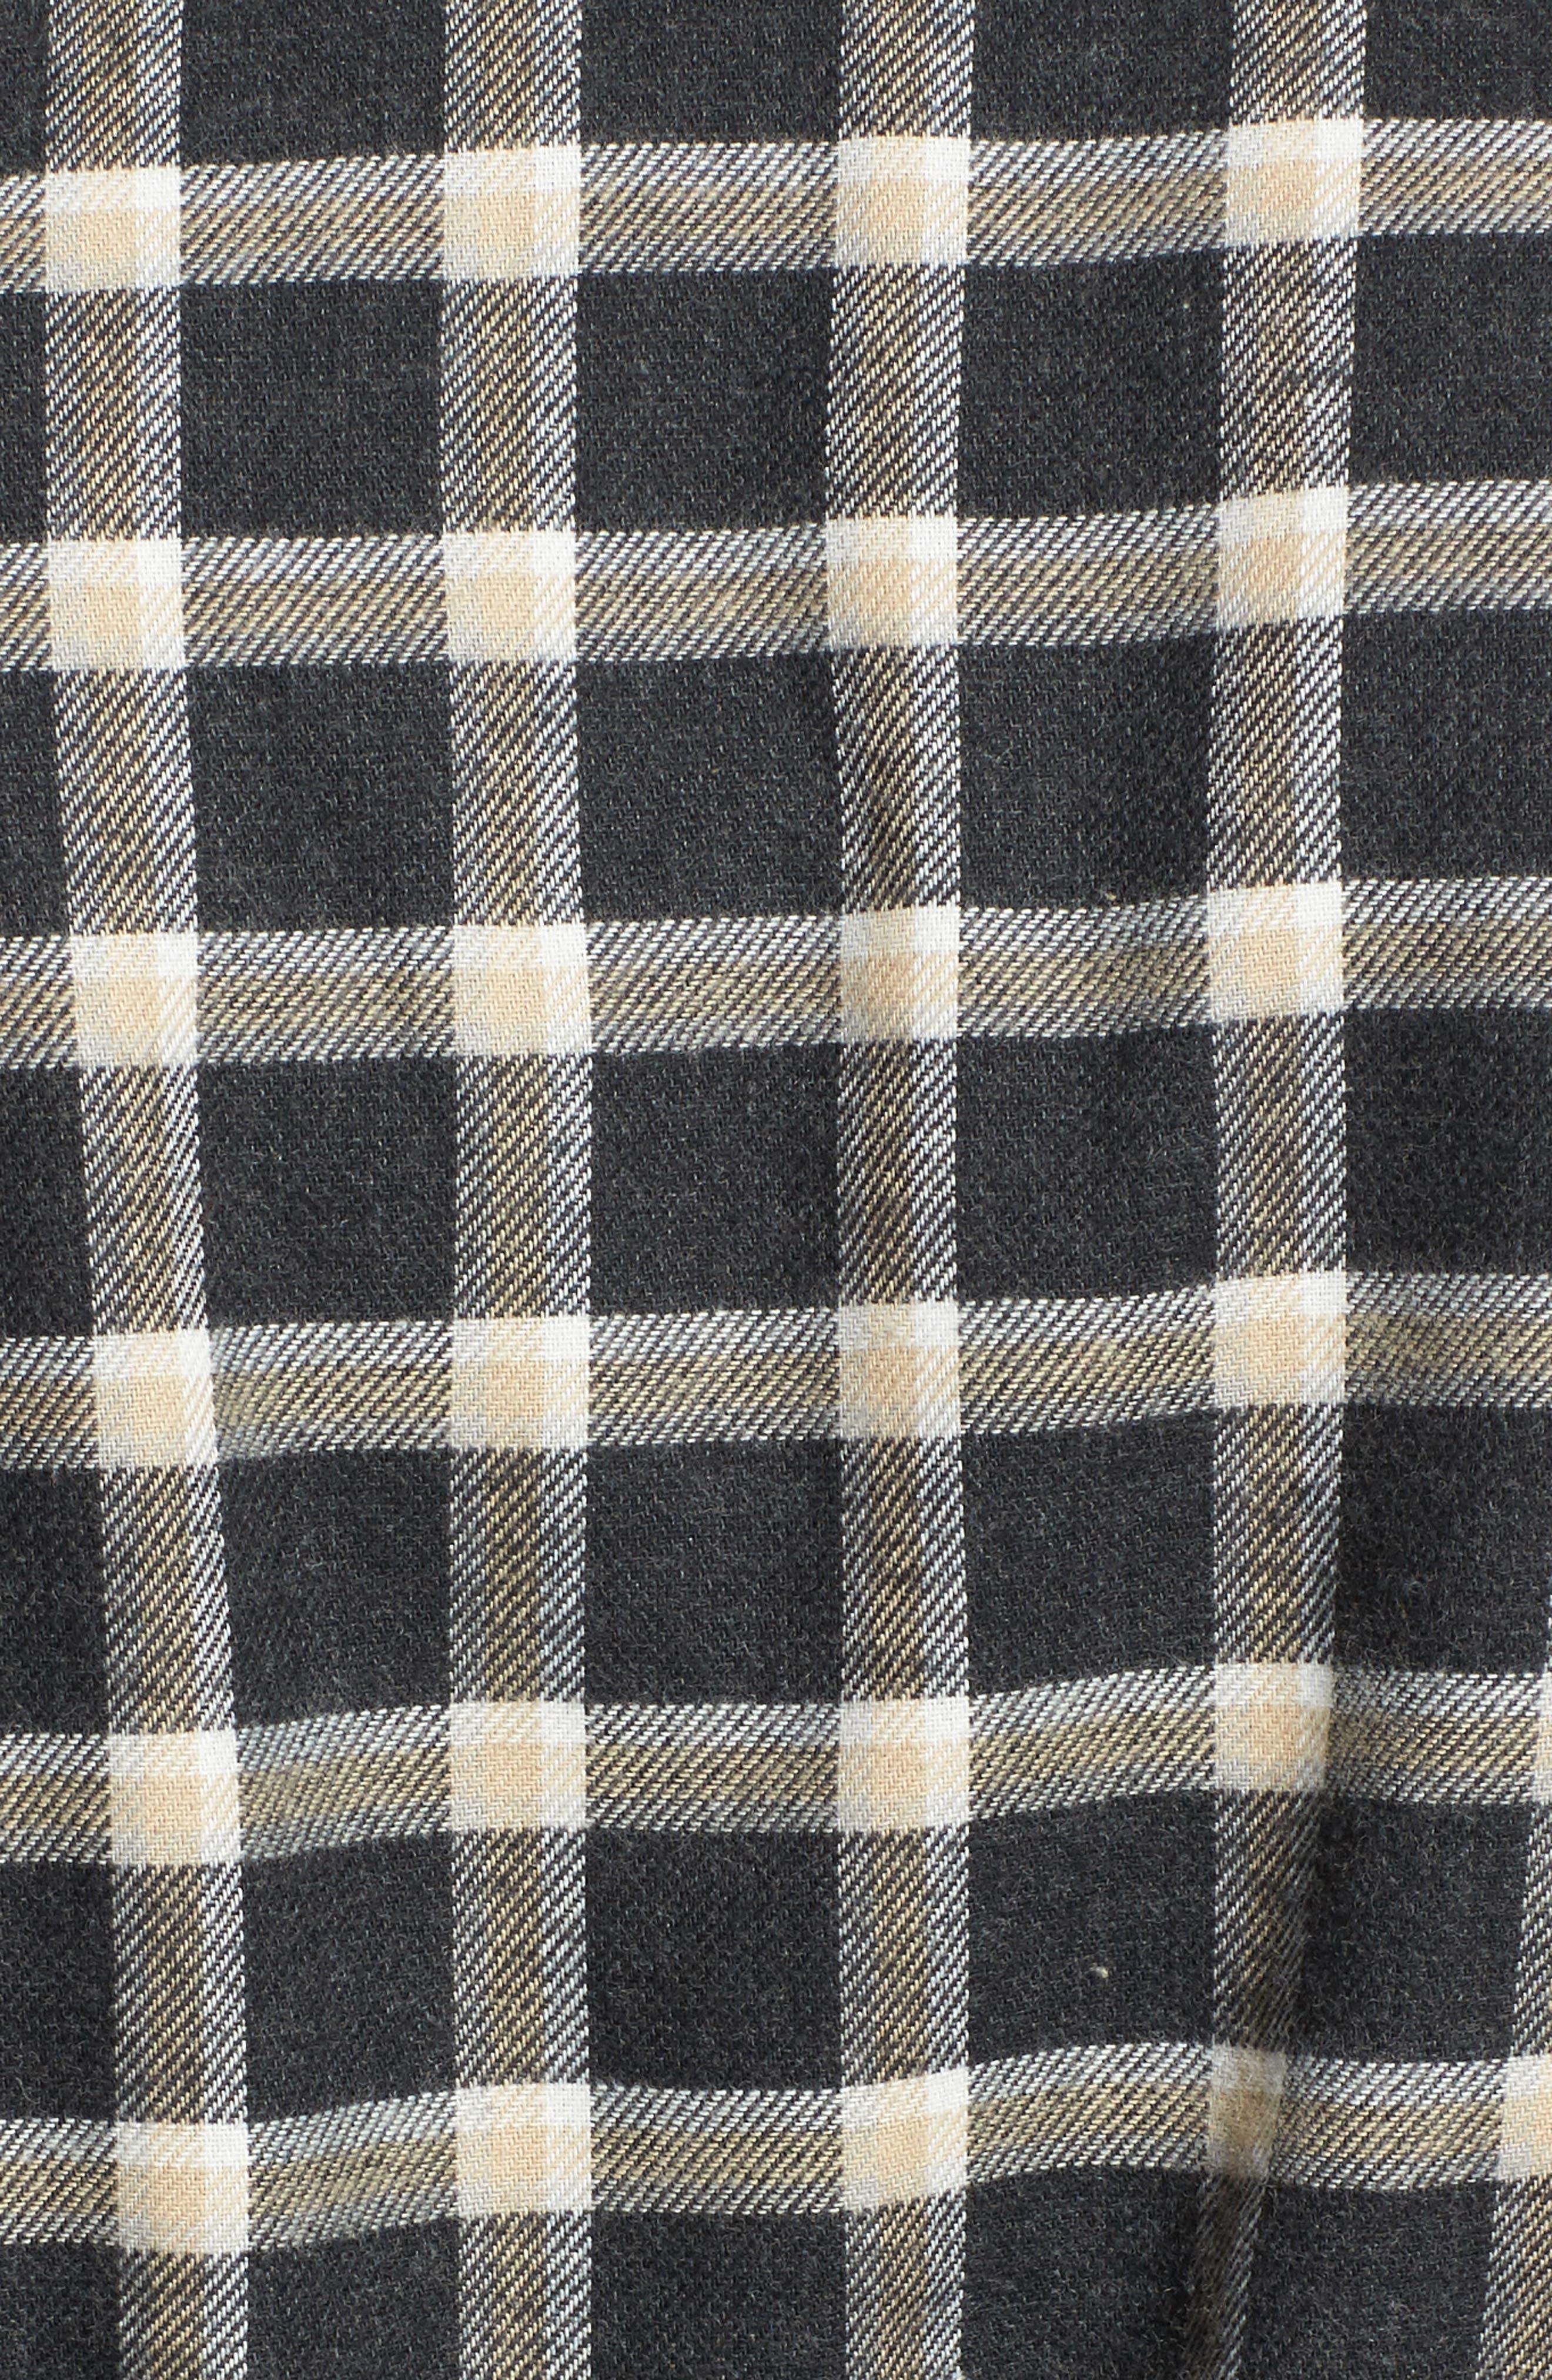 Kalib Plaid Flannel Robe,                             Alternate thumbnail 5, color,                             Black